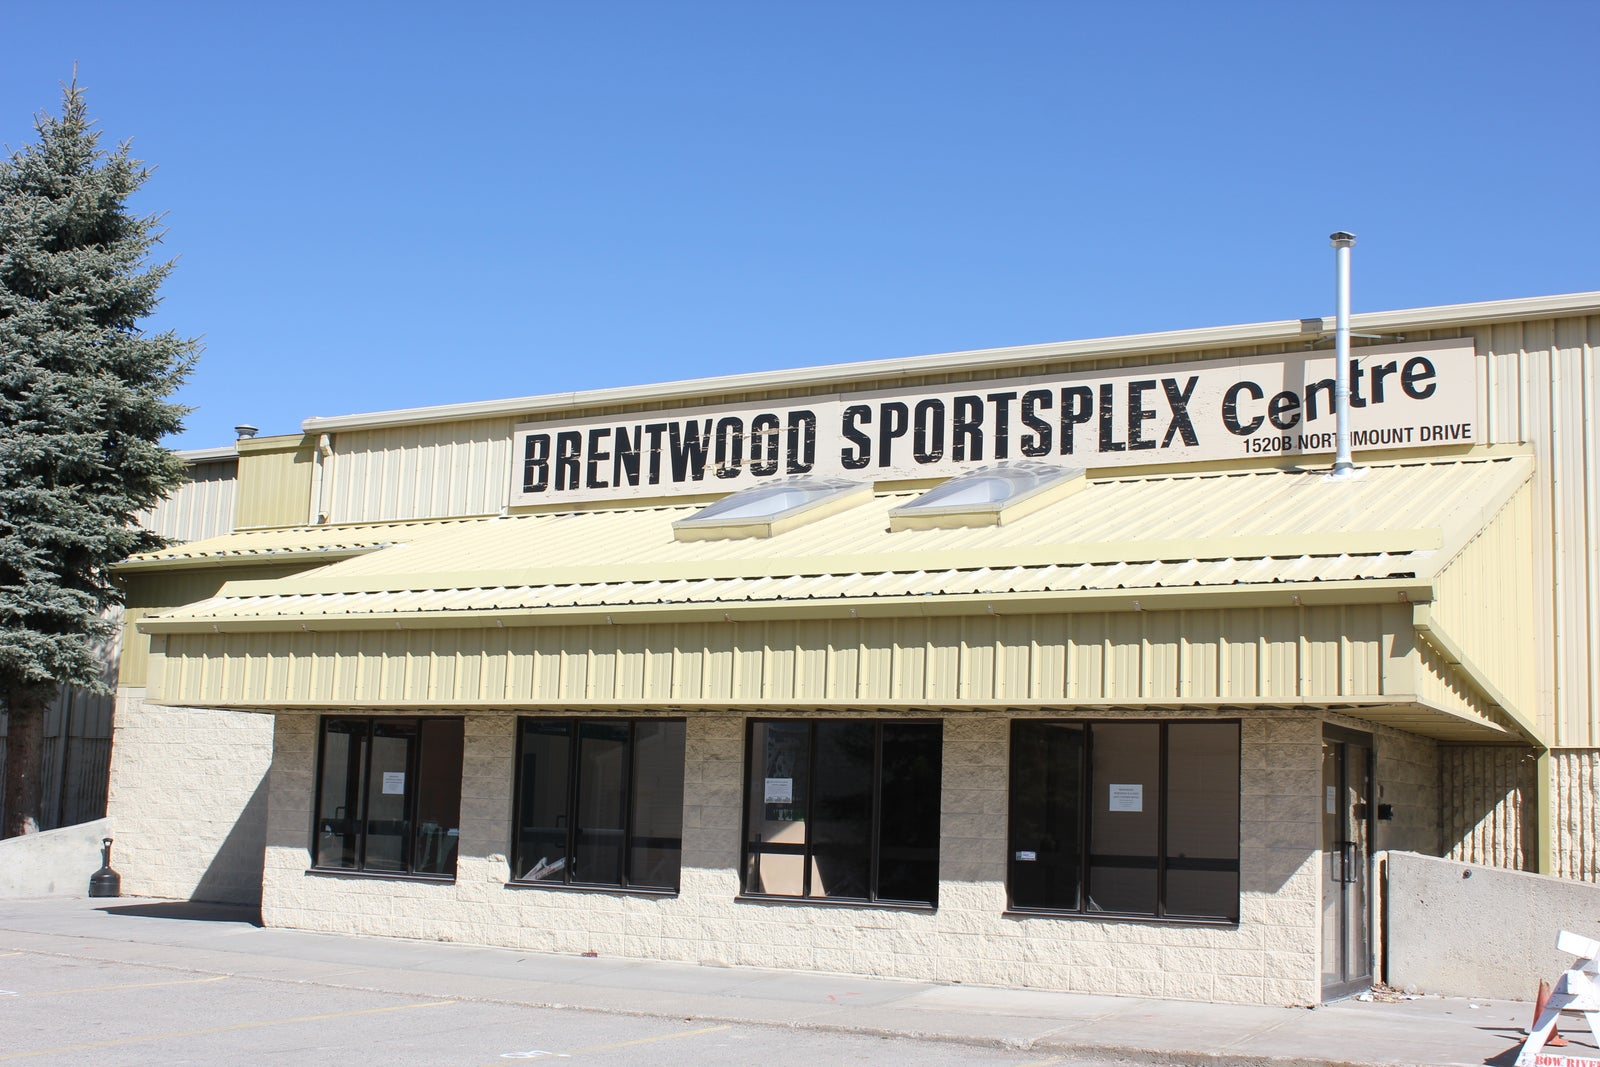 Brentwood Sportsplex